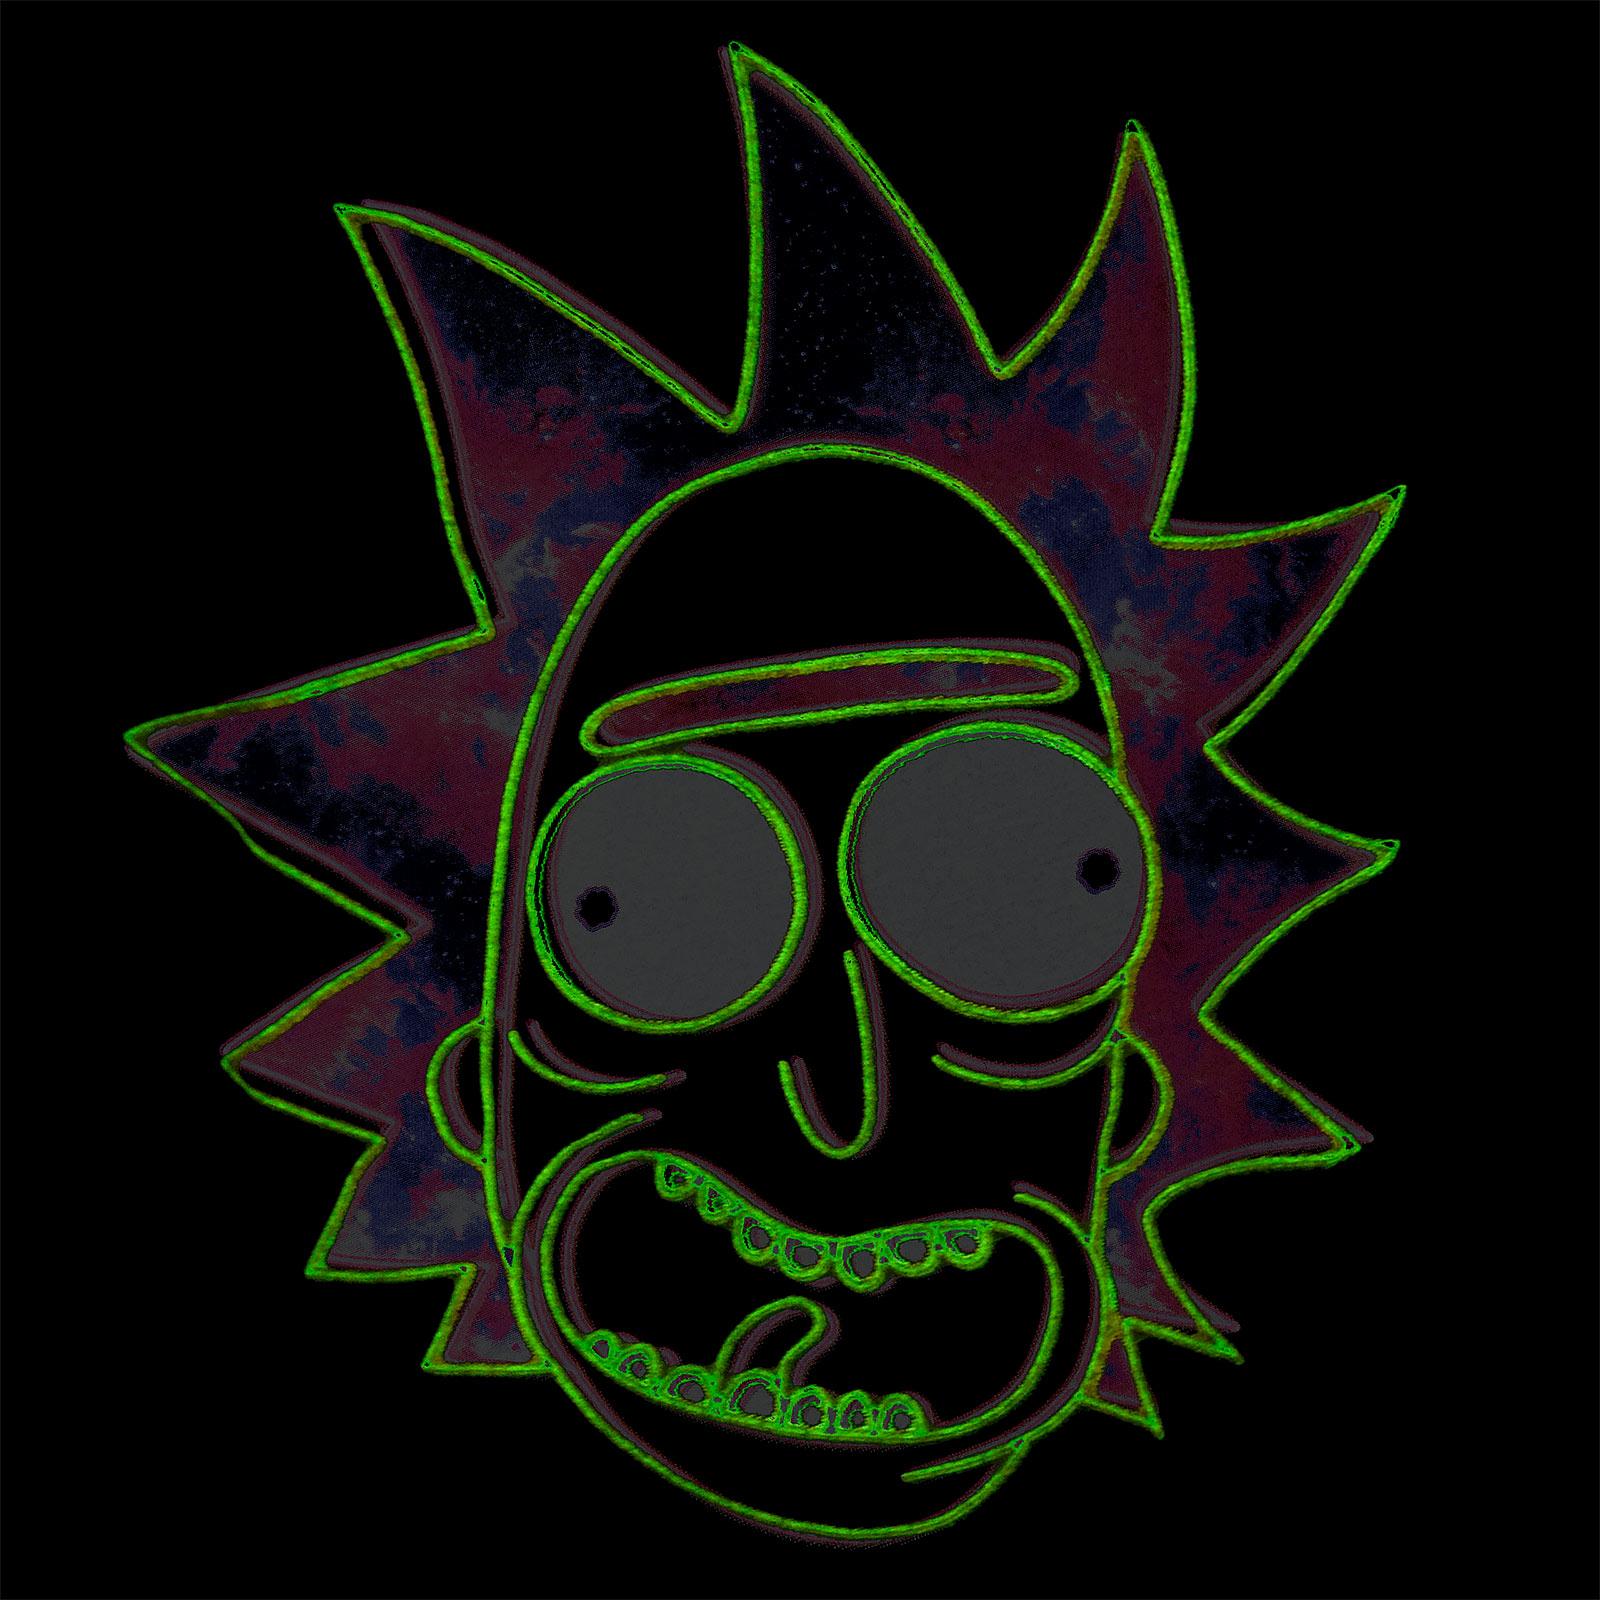 Rick and Morty - Neon Rick Glow in the Dark T-Shirt schwarz